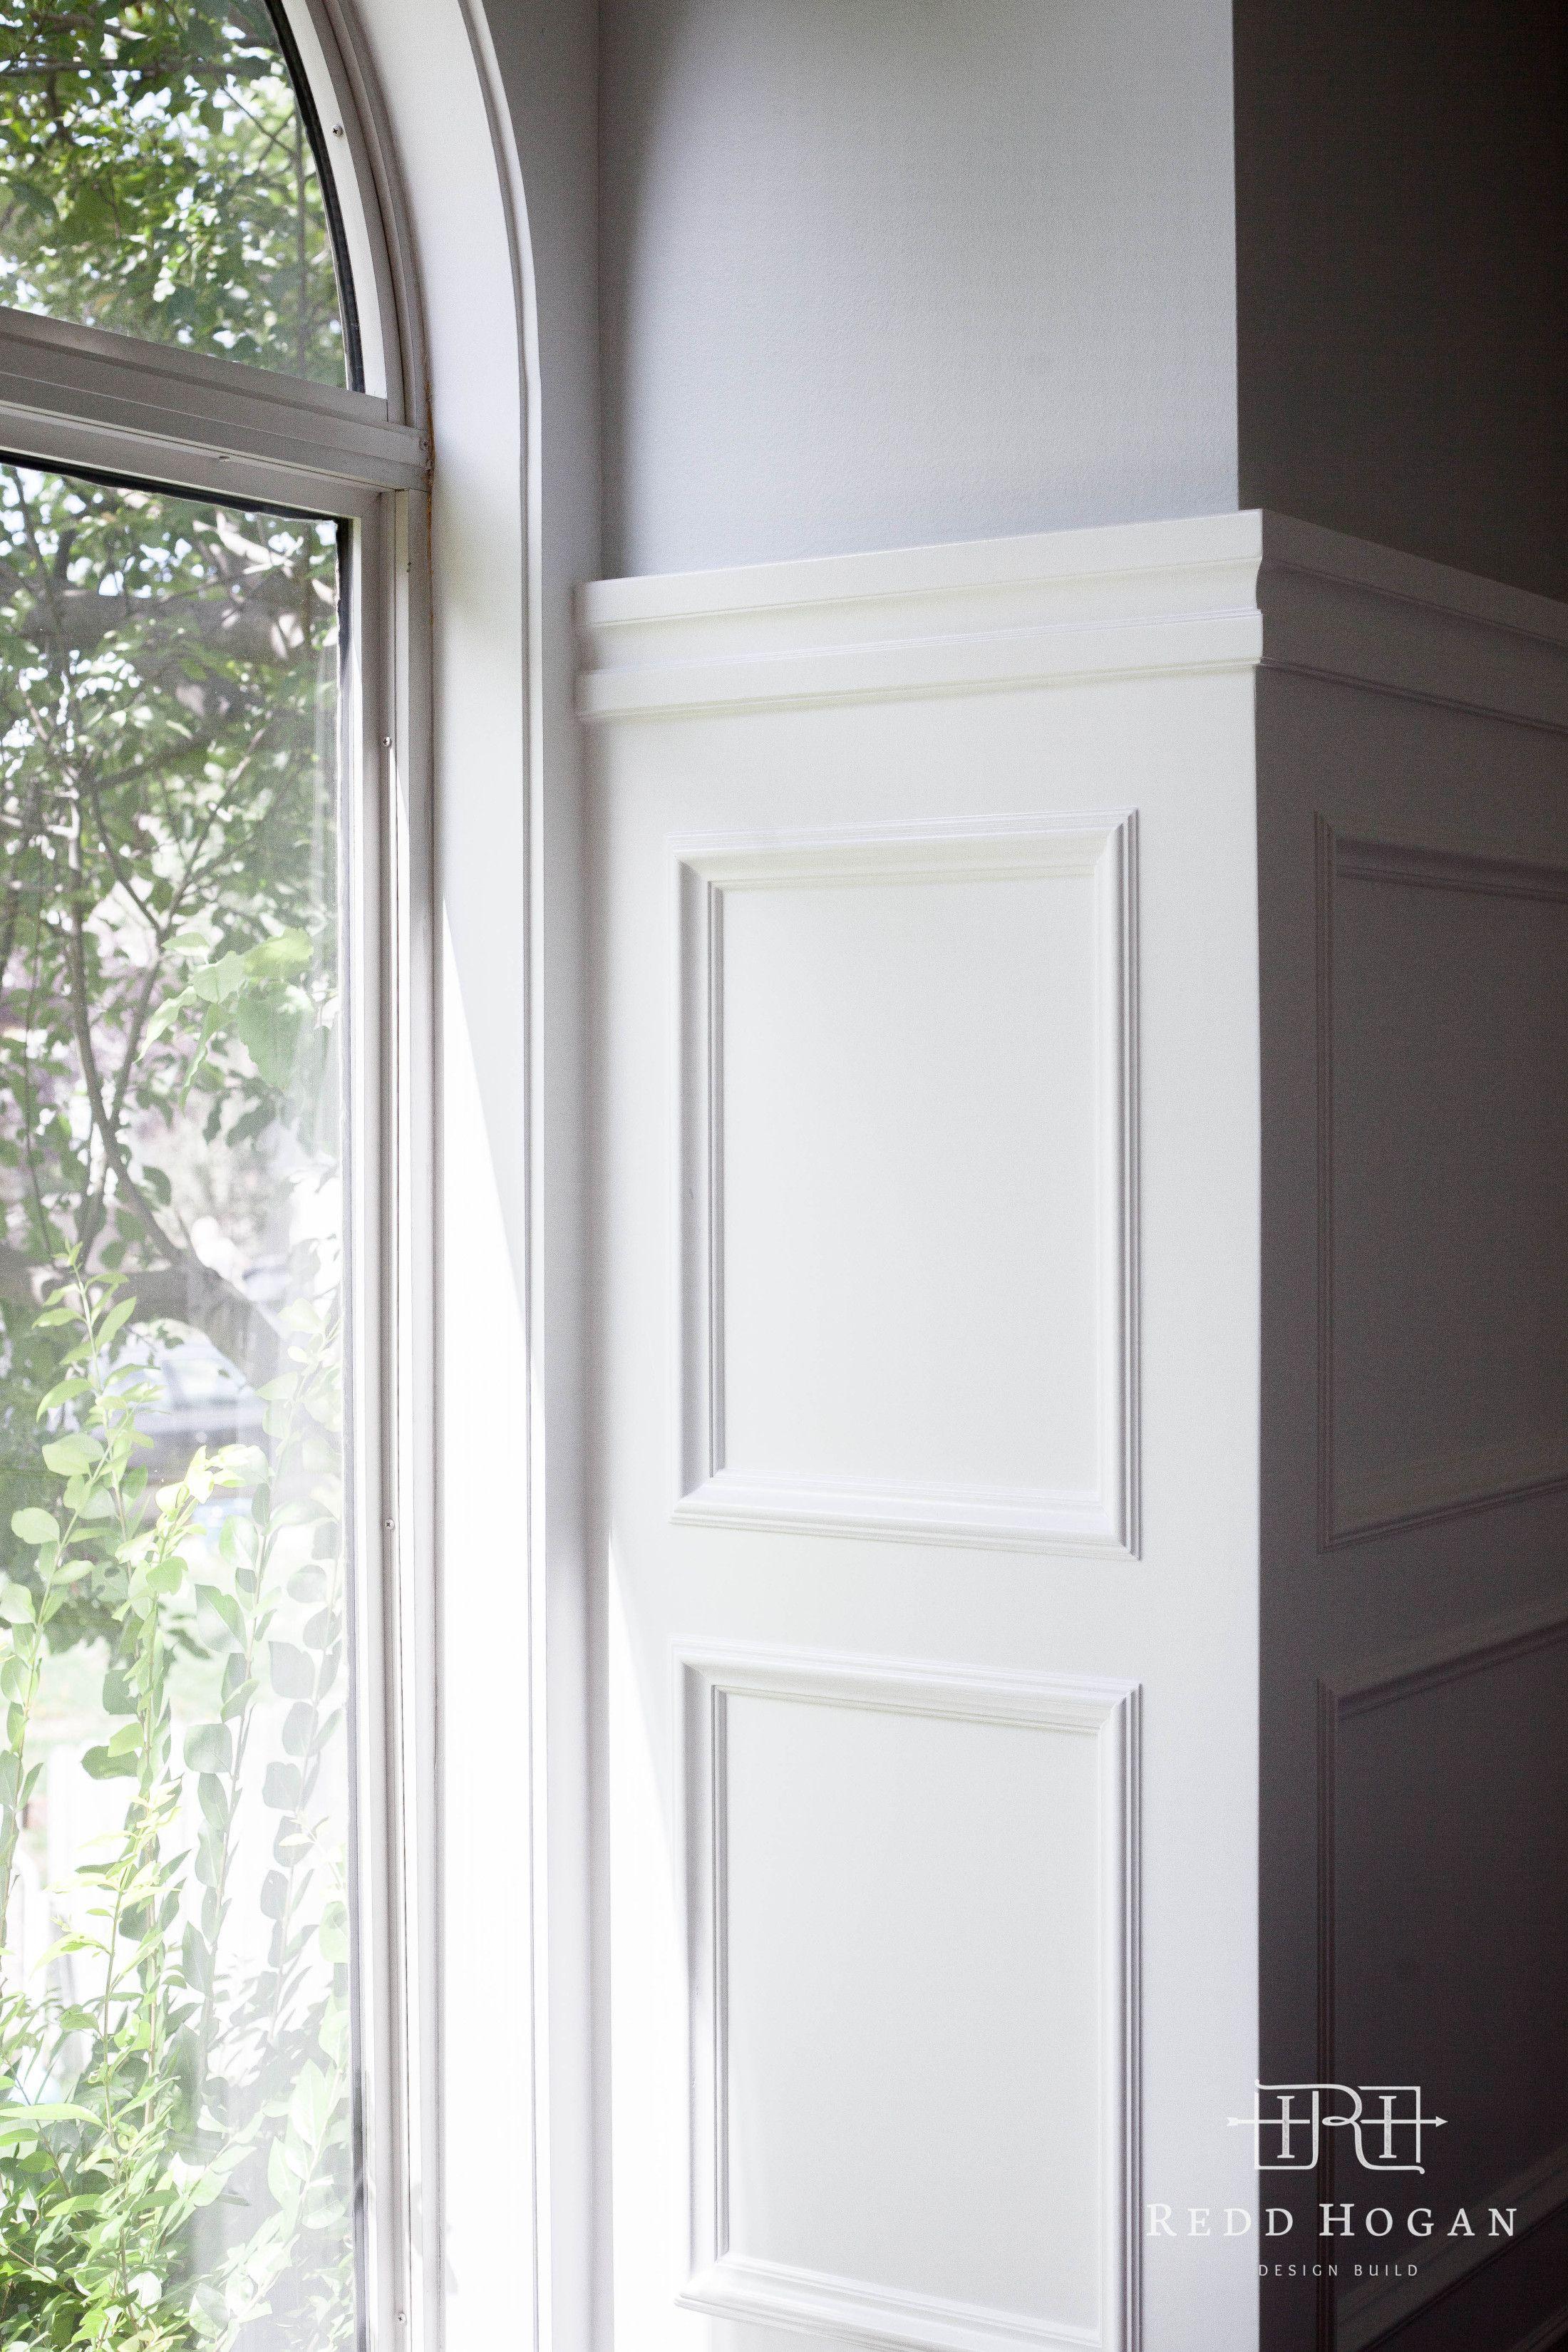 Window moulding ideas  redd hogan design build  holladaymain floor remodel wainscot